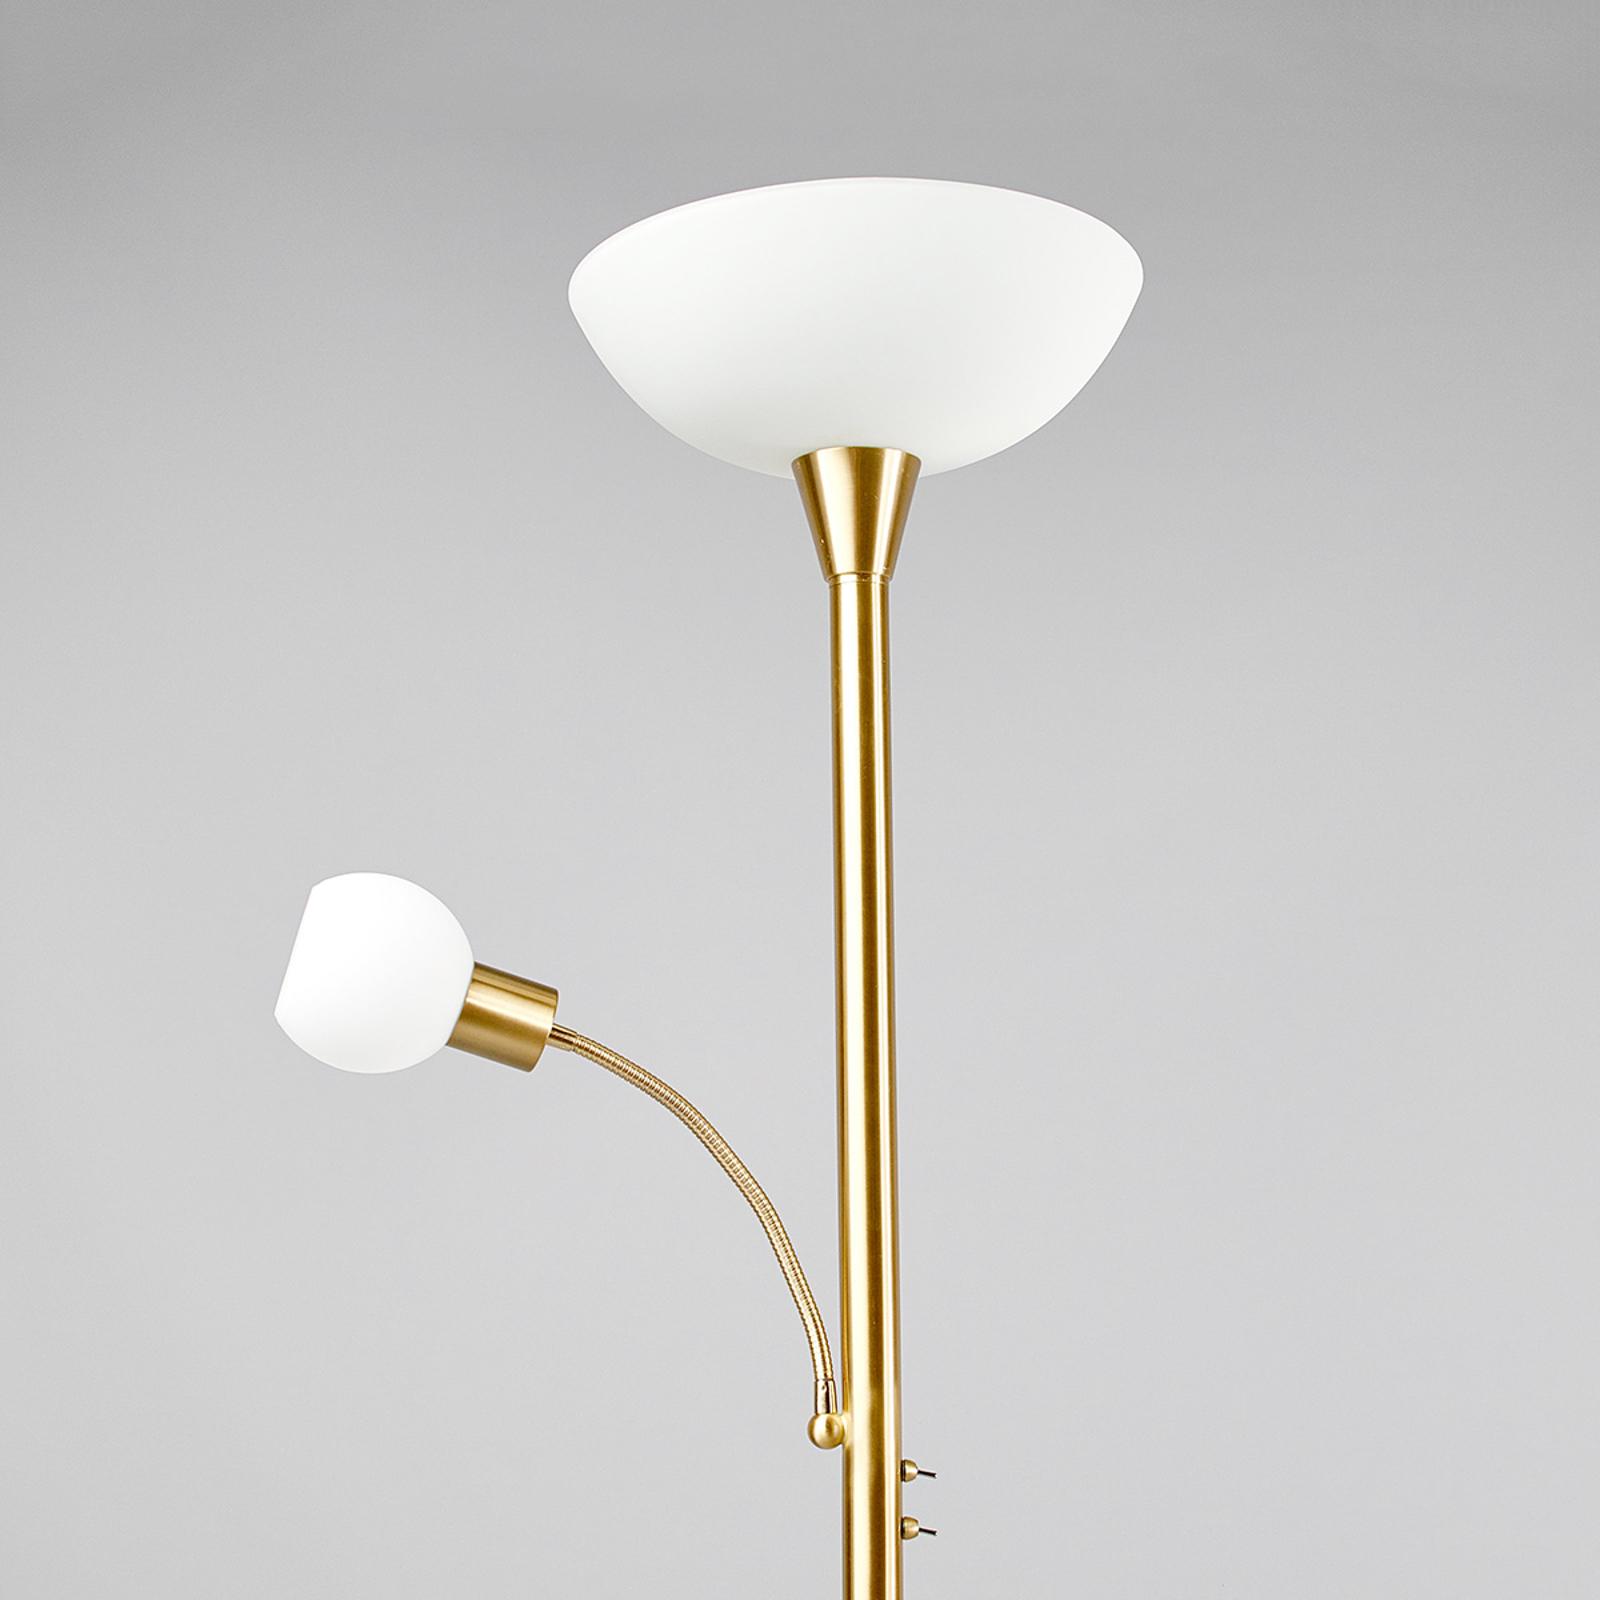 Led-uplight Elaina in Messing met leeslamp